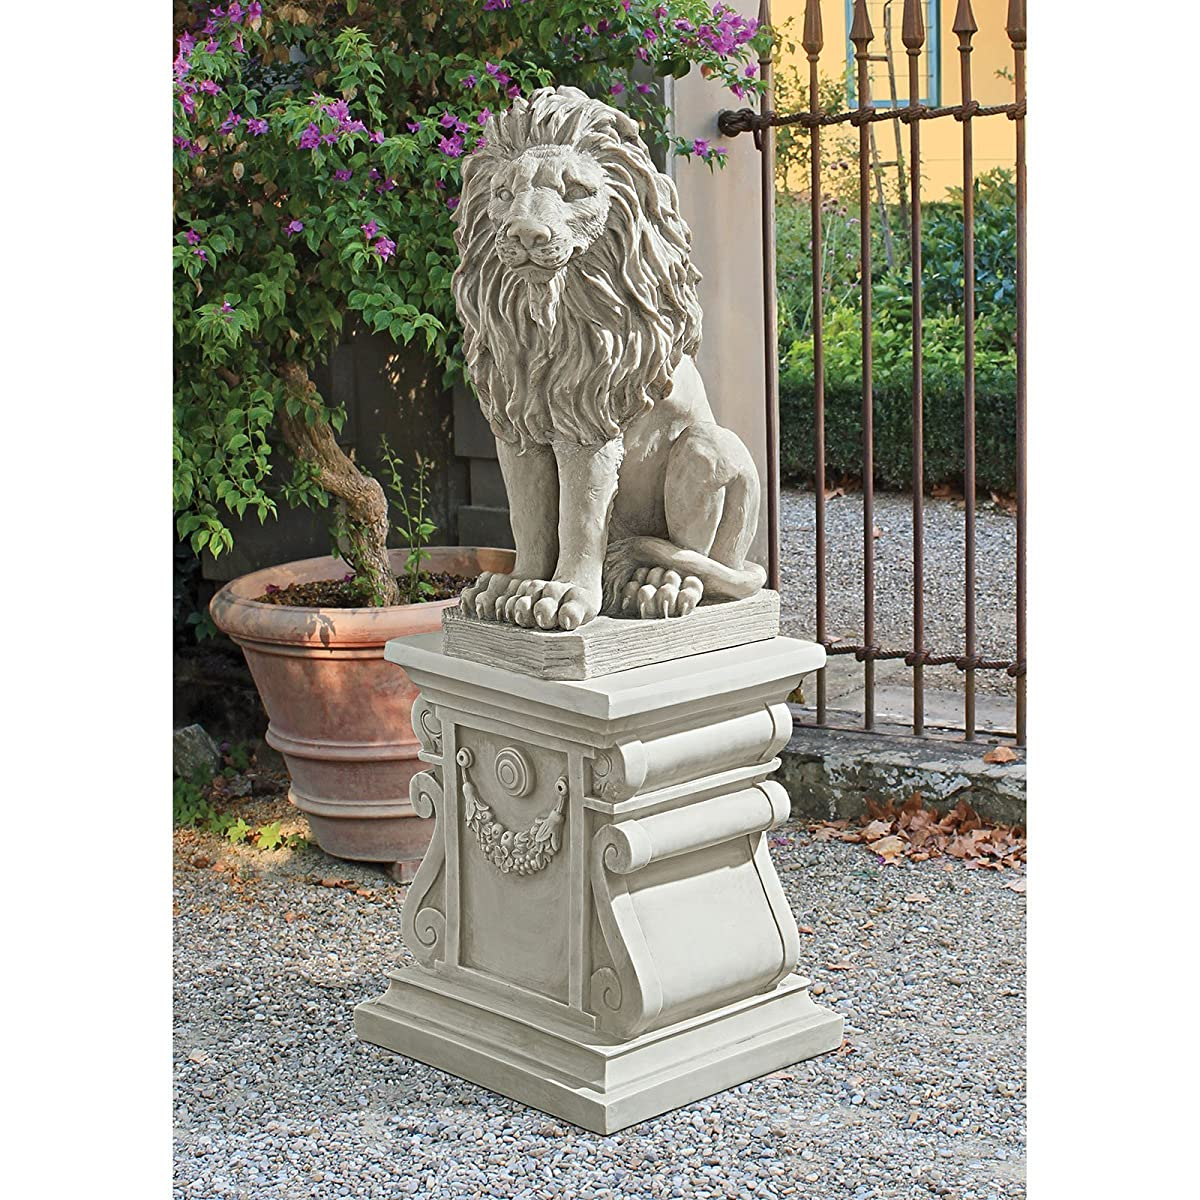 Design Toscano Mansfield Manor Lion Sentinel Statue, Set of 2